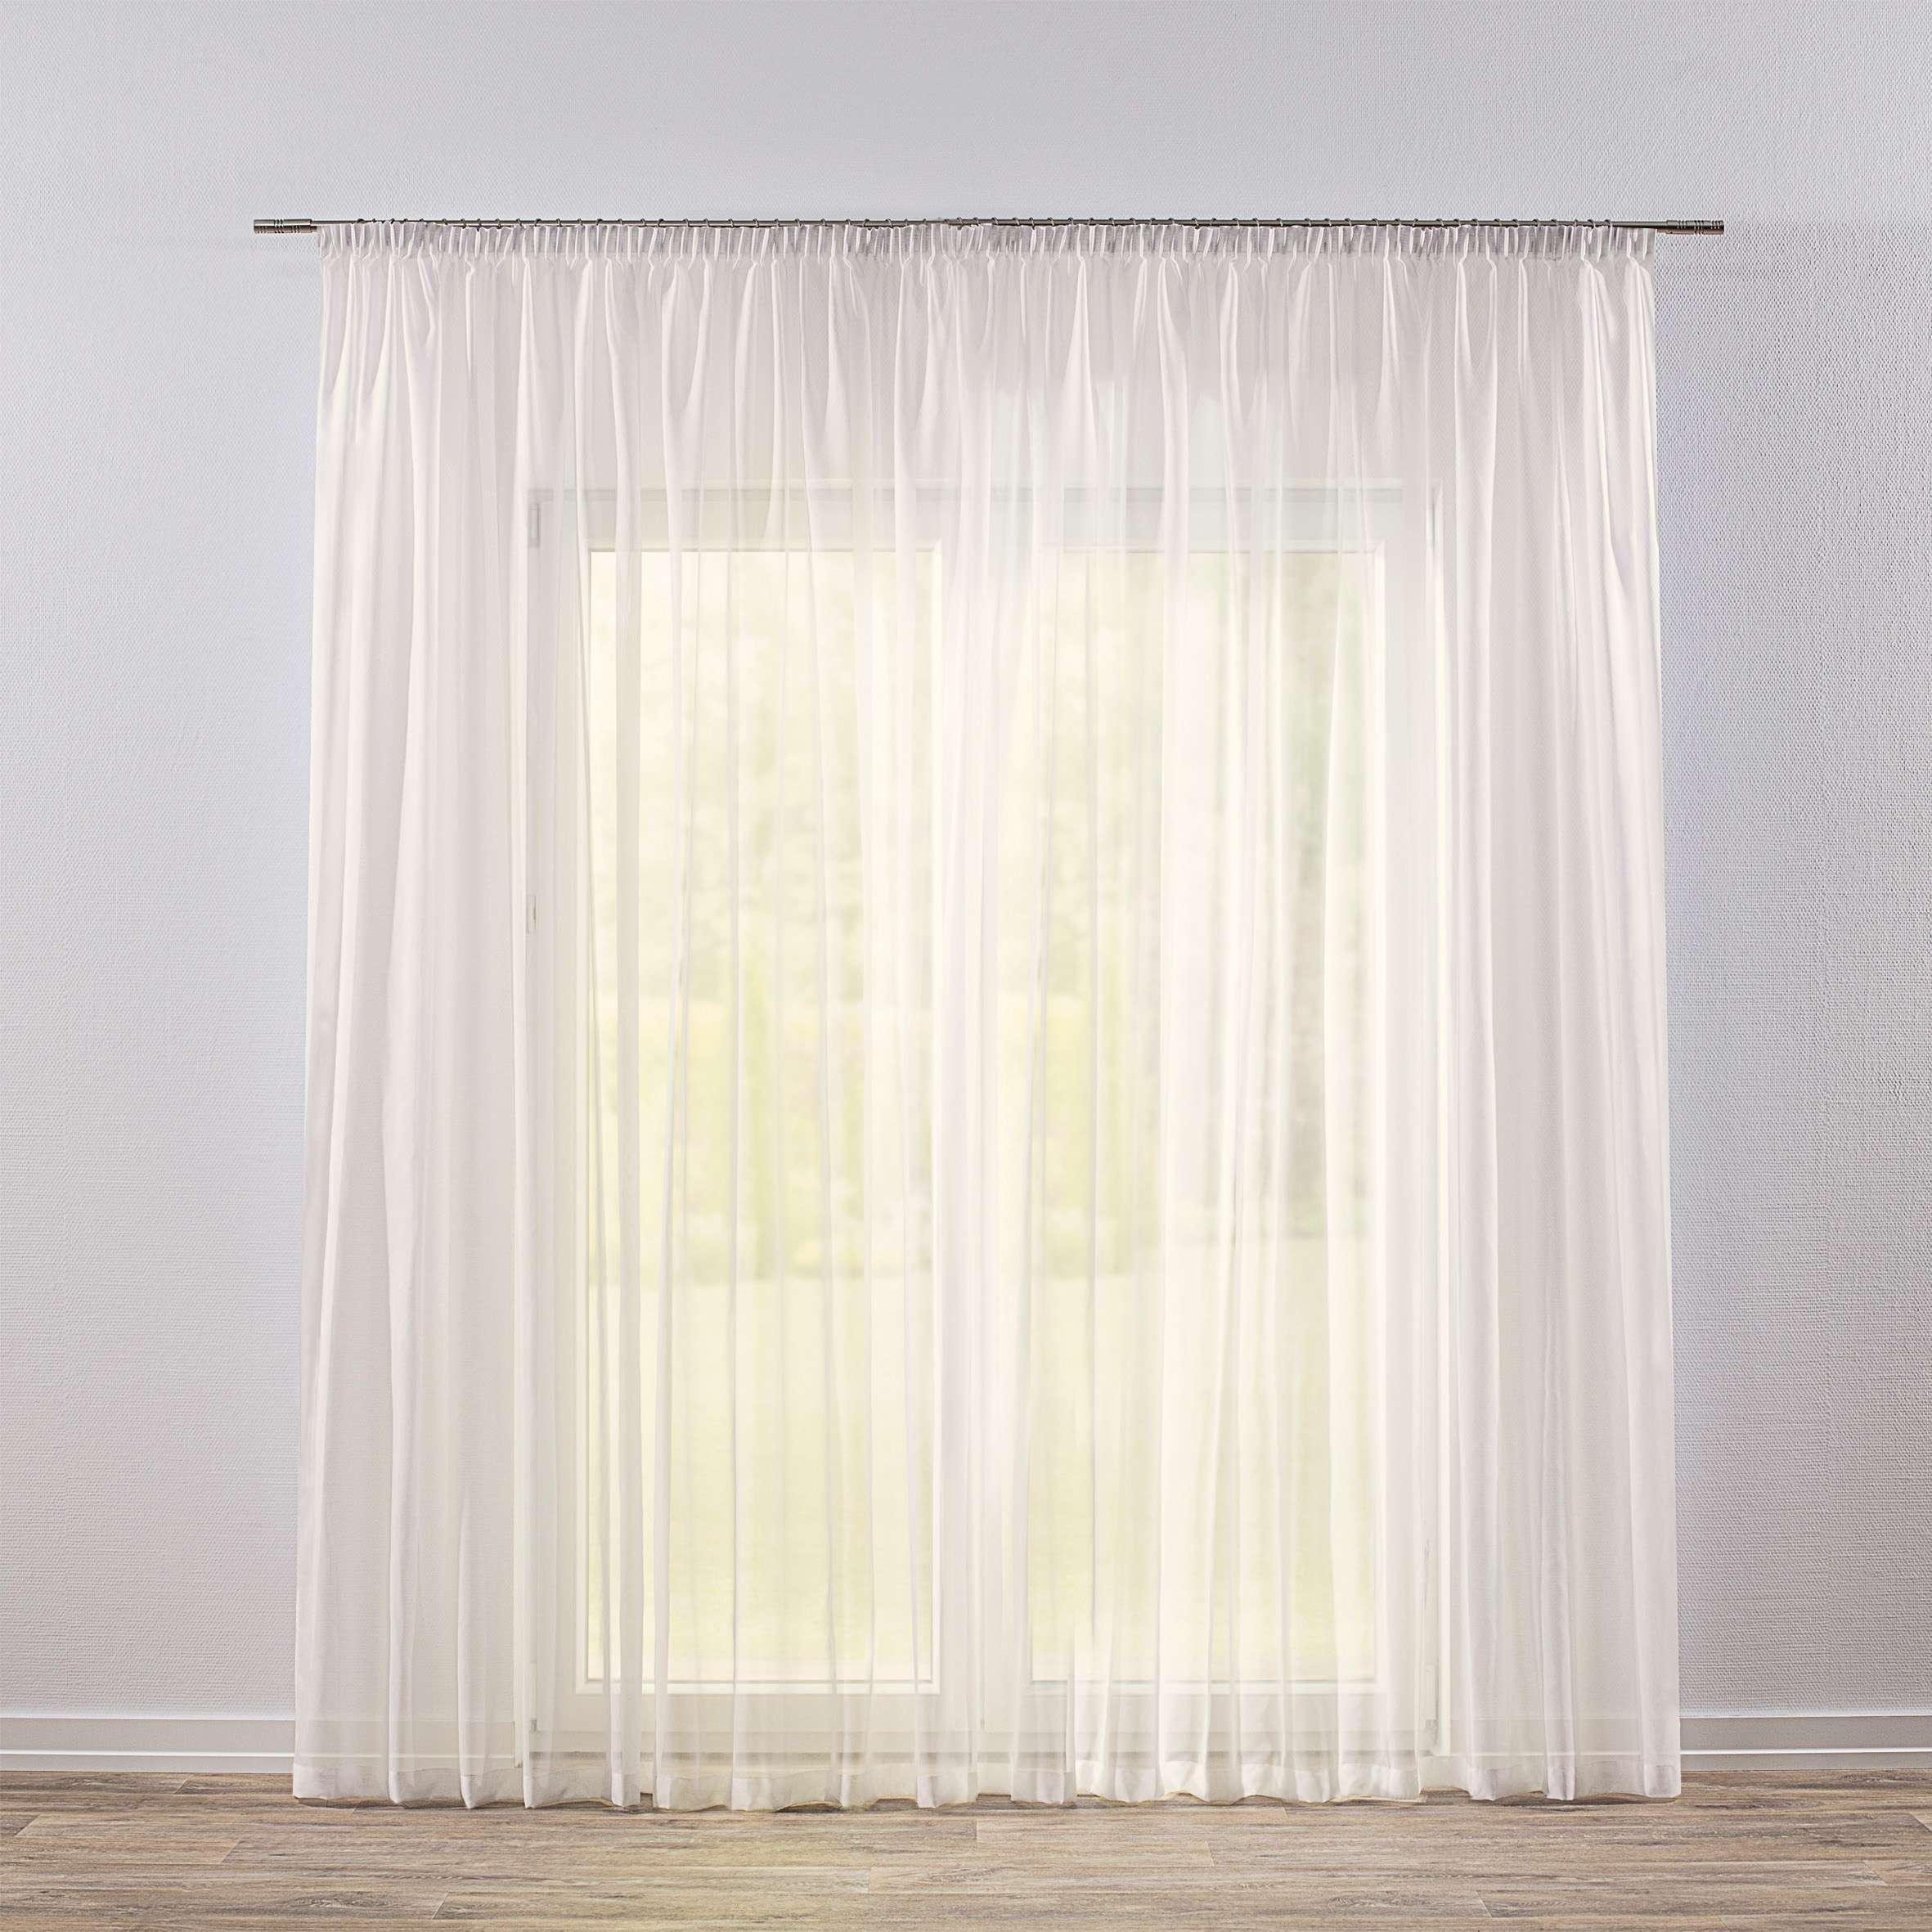 Pencil Pleat Voile Net Curtain Ivory 900 01 300 X 260 Cm 118 102 Inch Dekoria